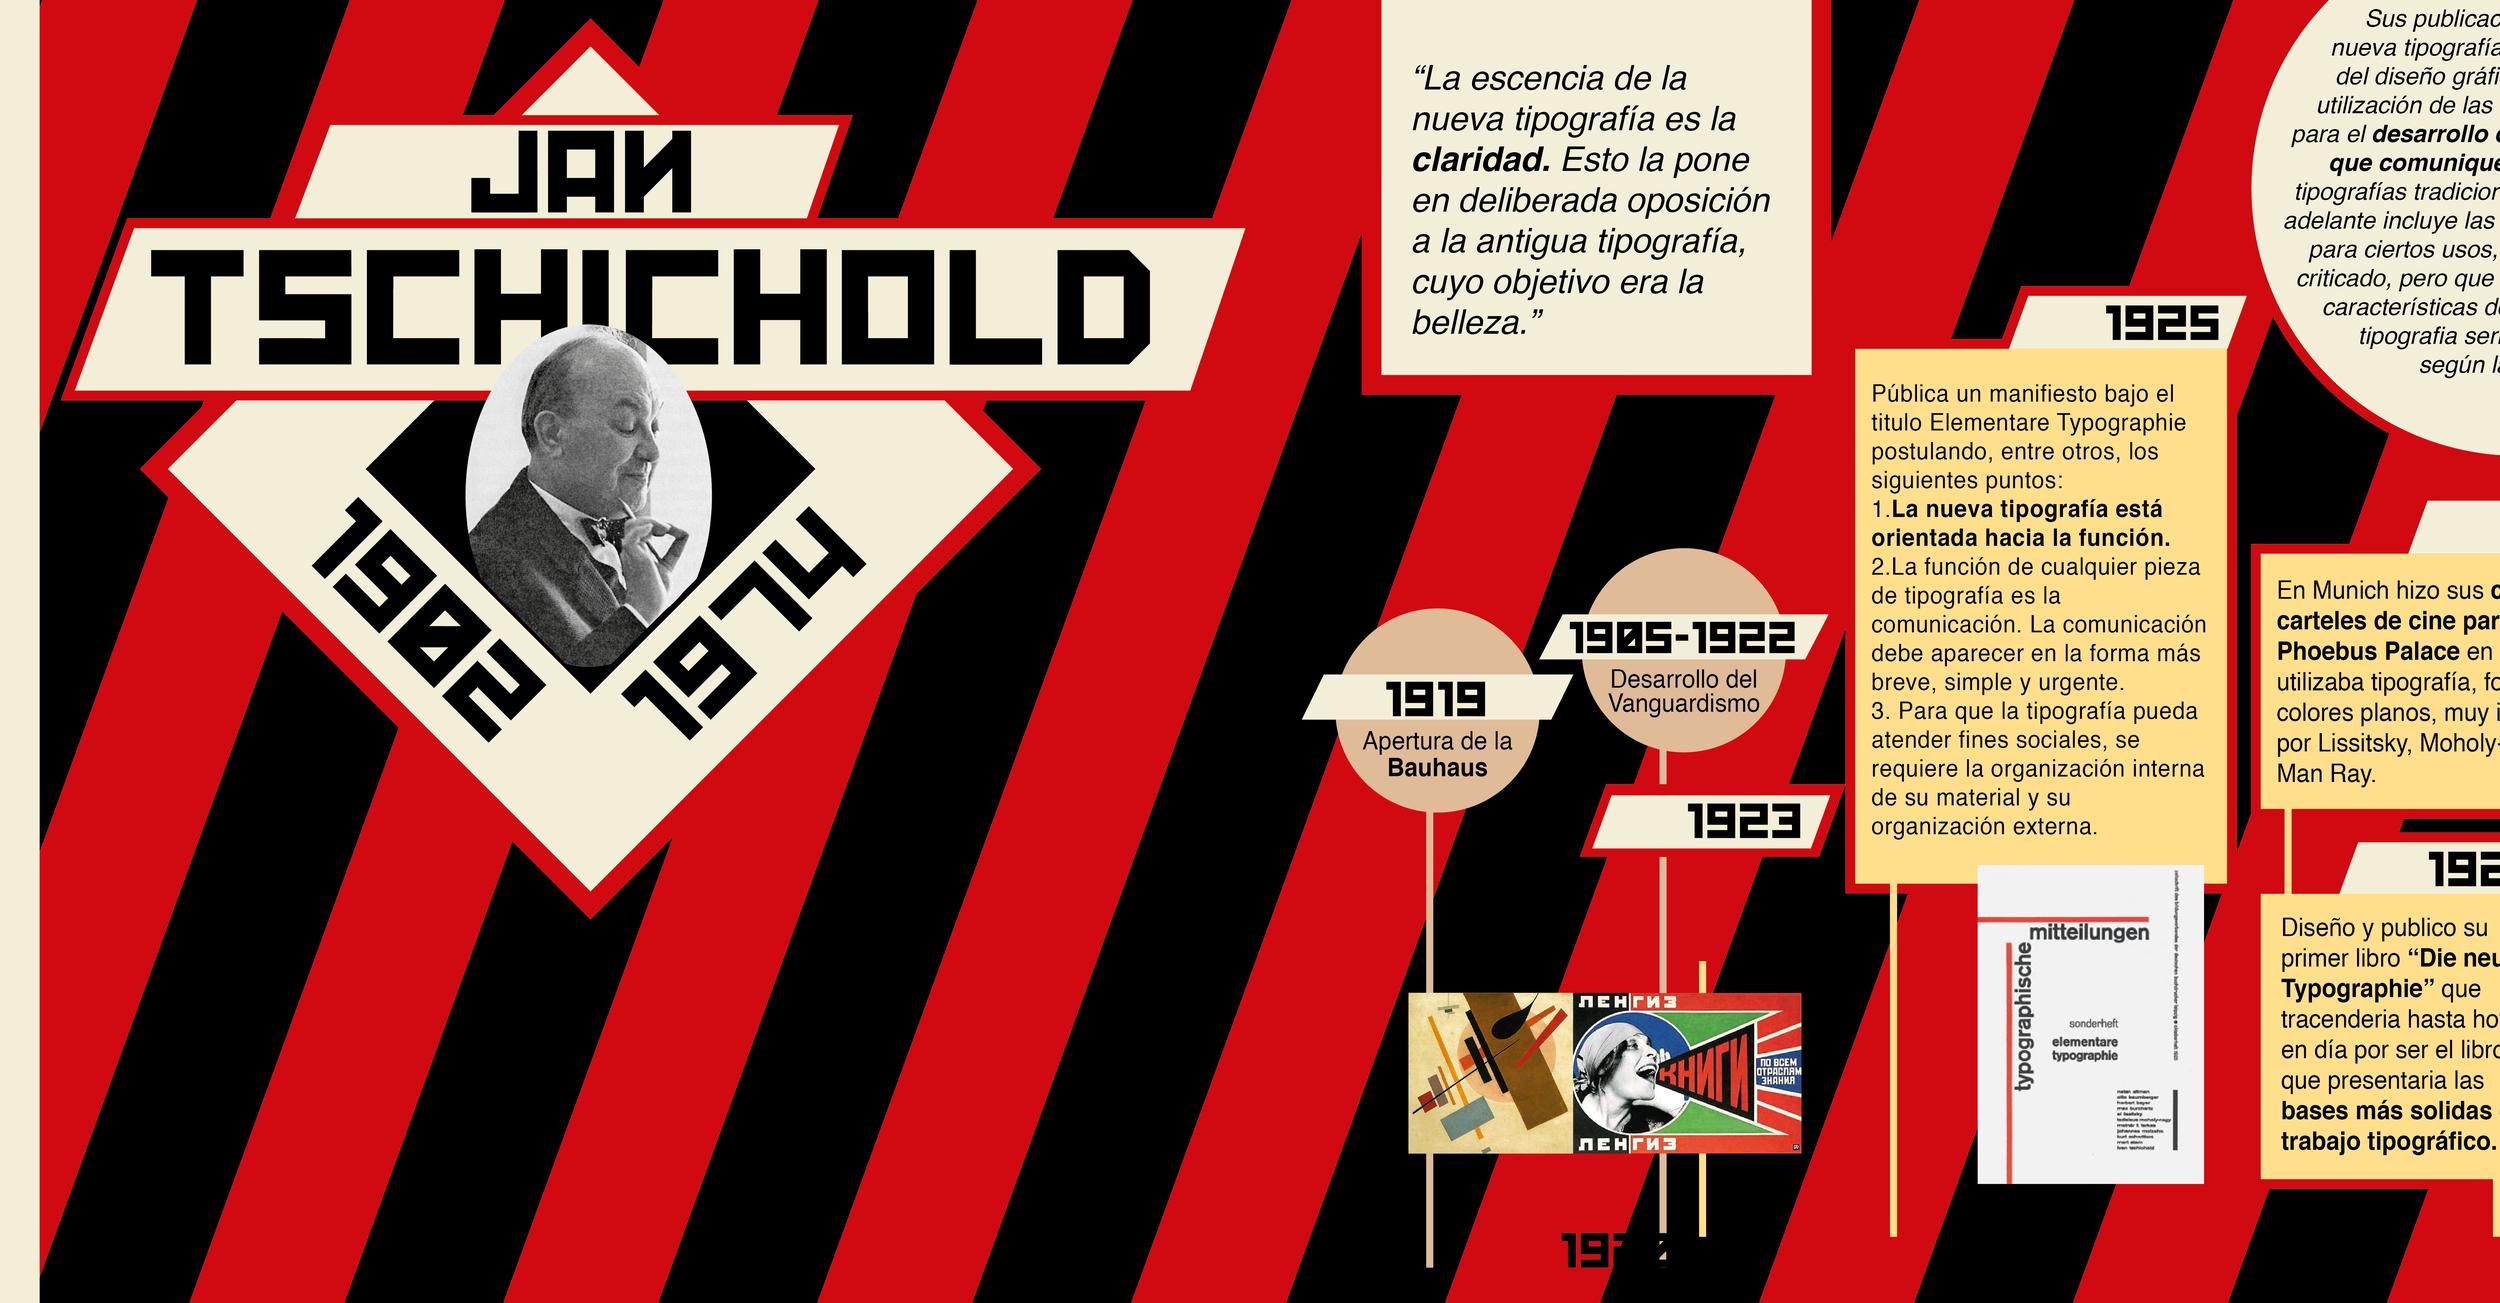 Jan Tschichold Timeline Infographic